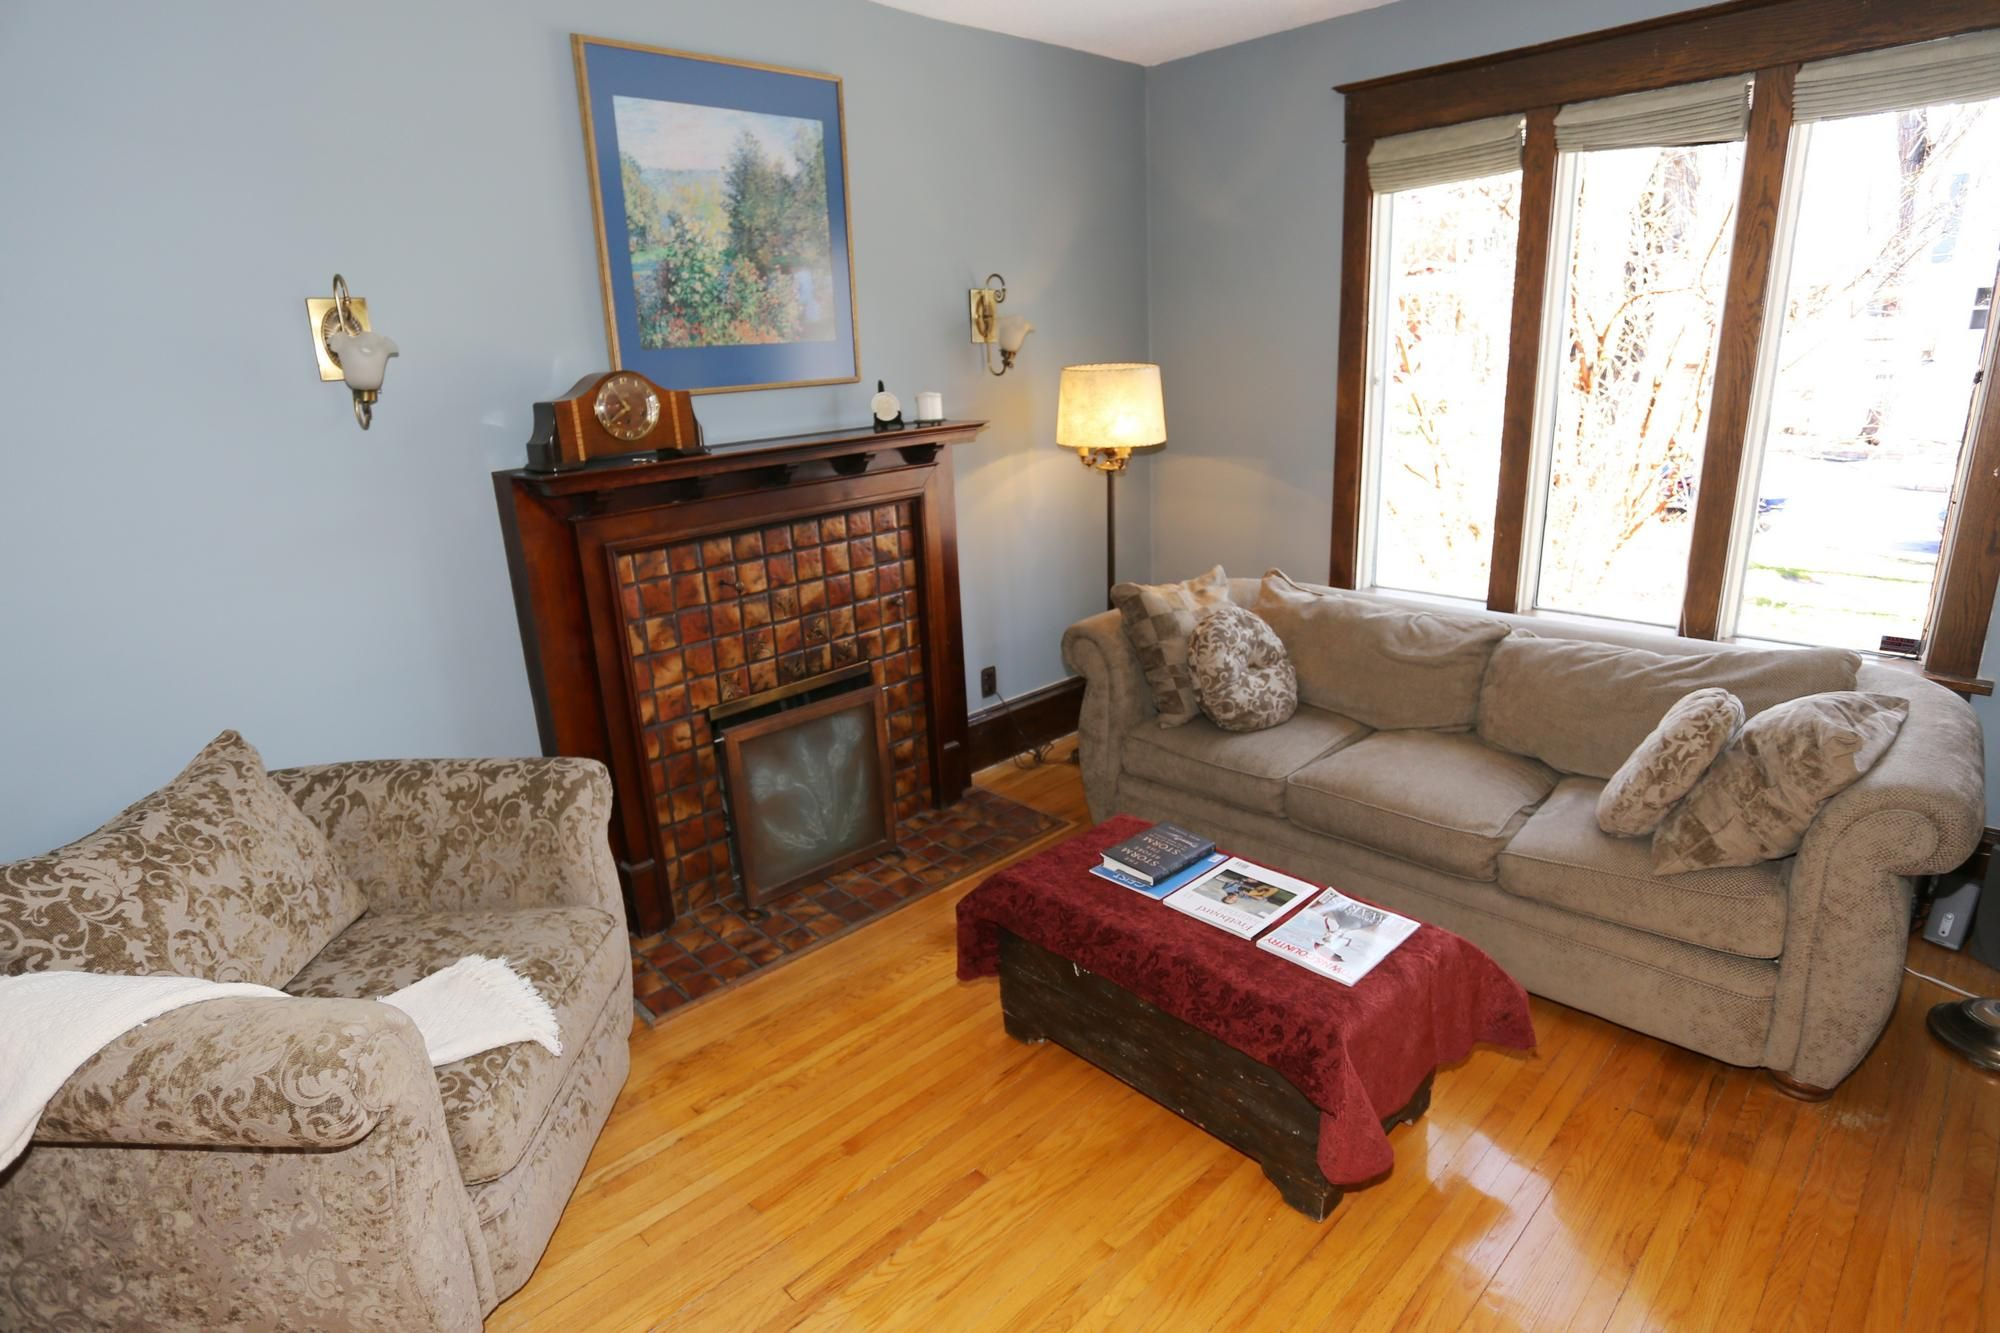 Photo 4: Photos: 96 Home Street in Winnipeg: Wolseley Single Family Detached for sale (5B)  : MLS®# 1810985